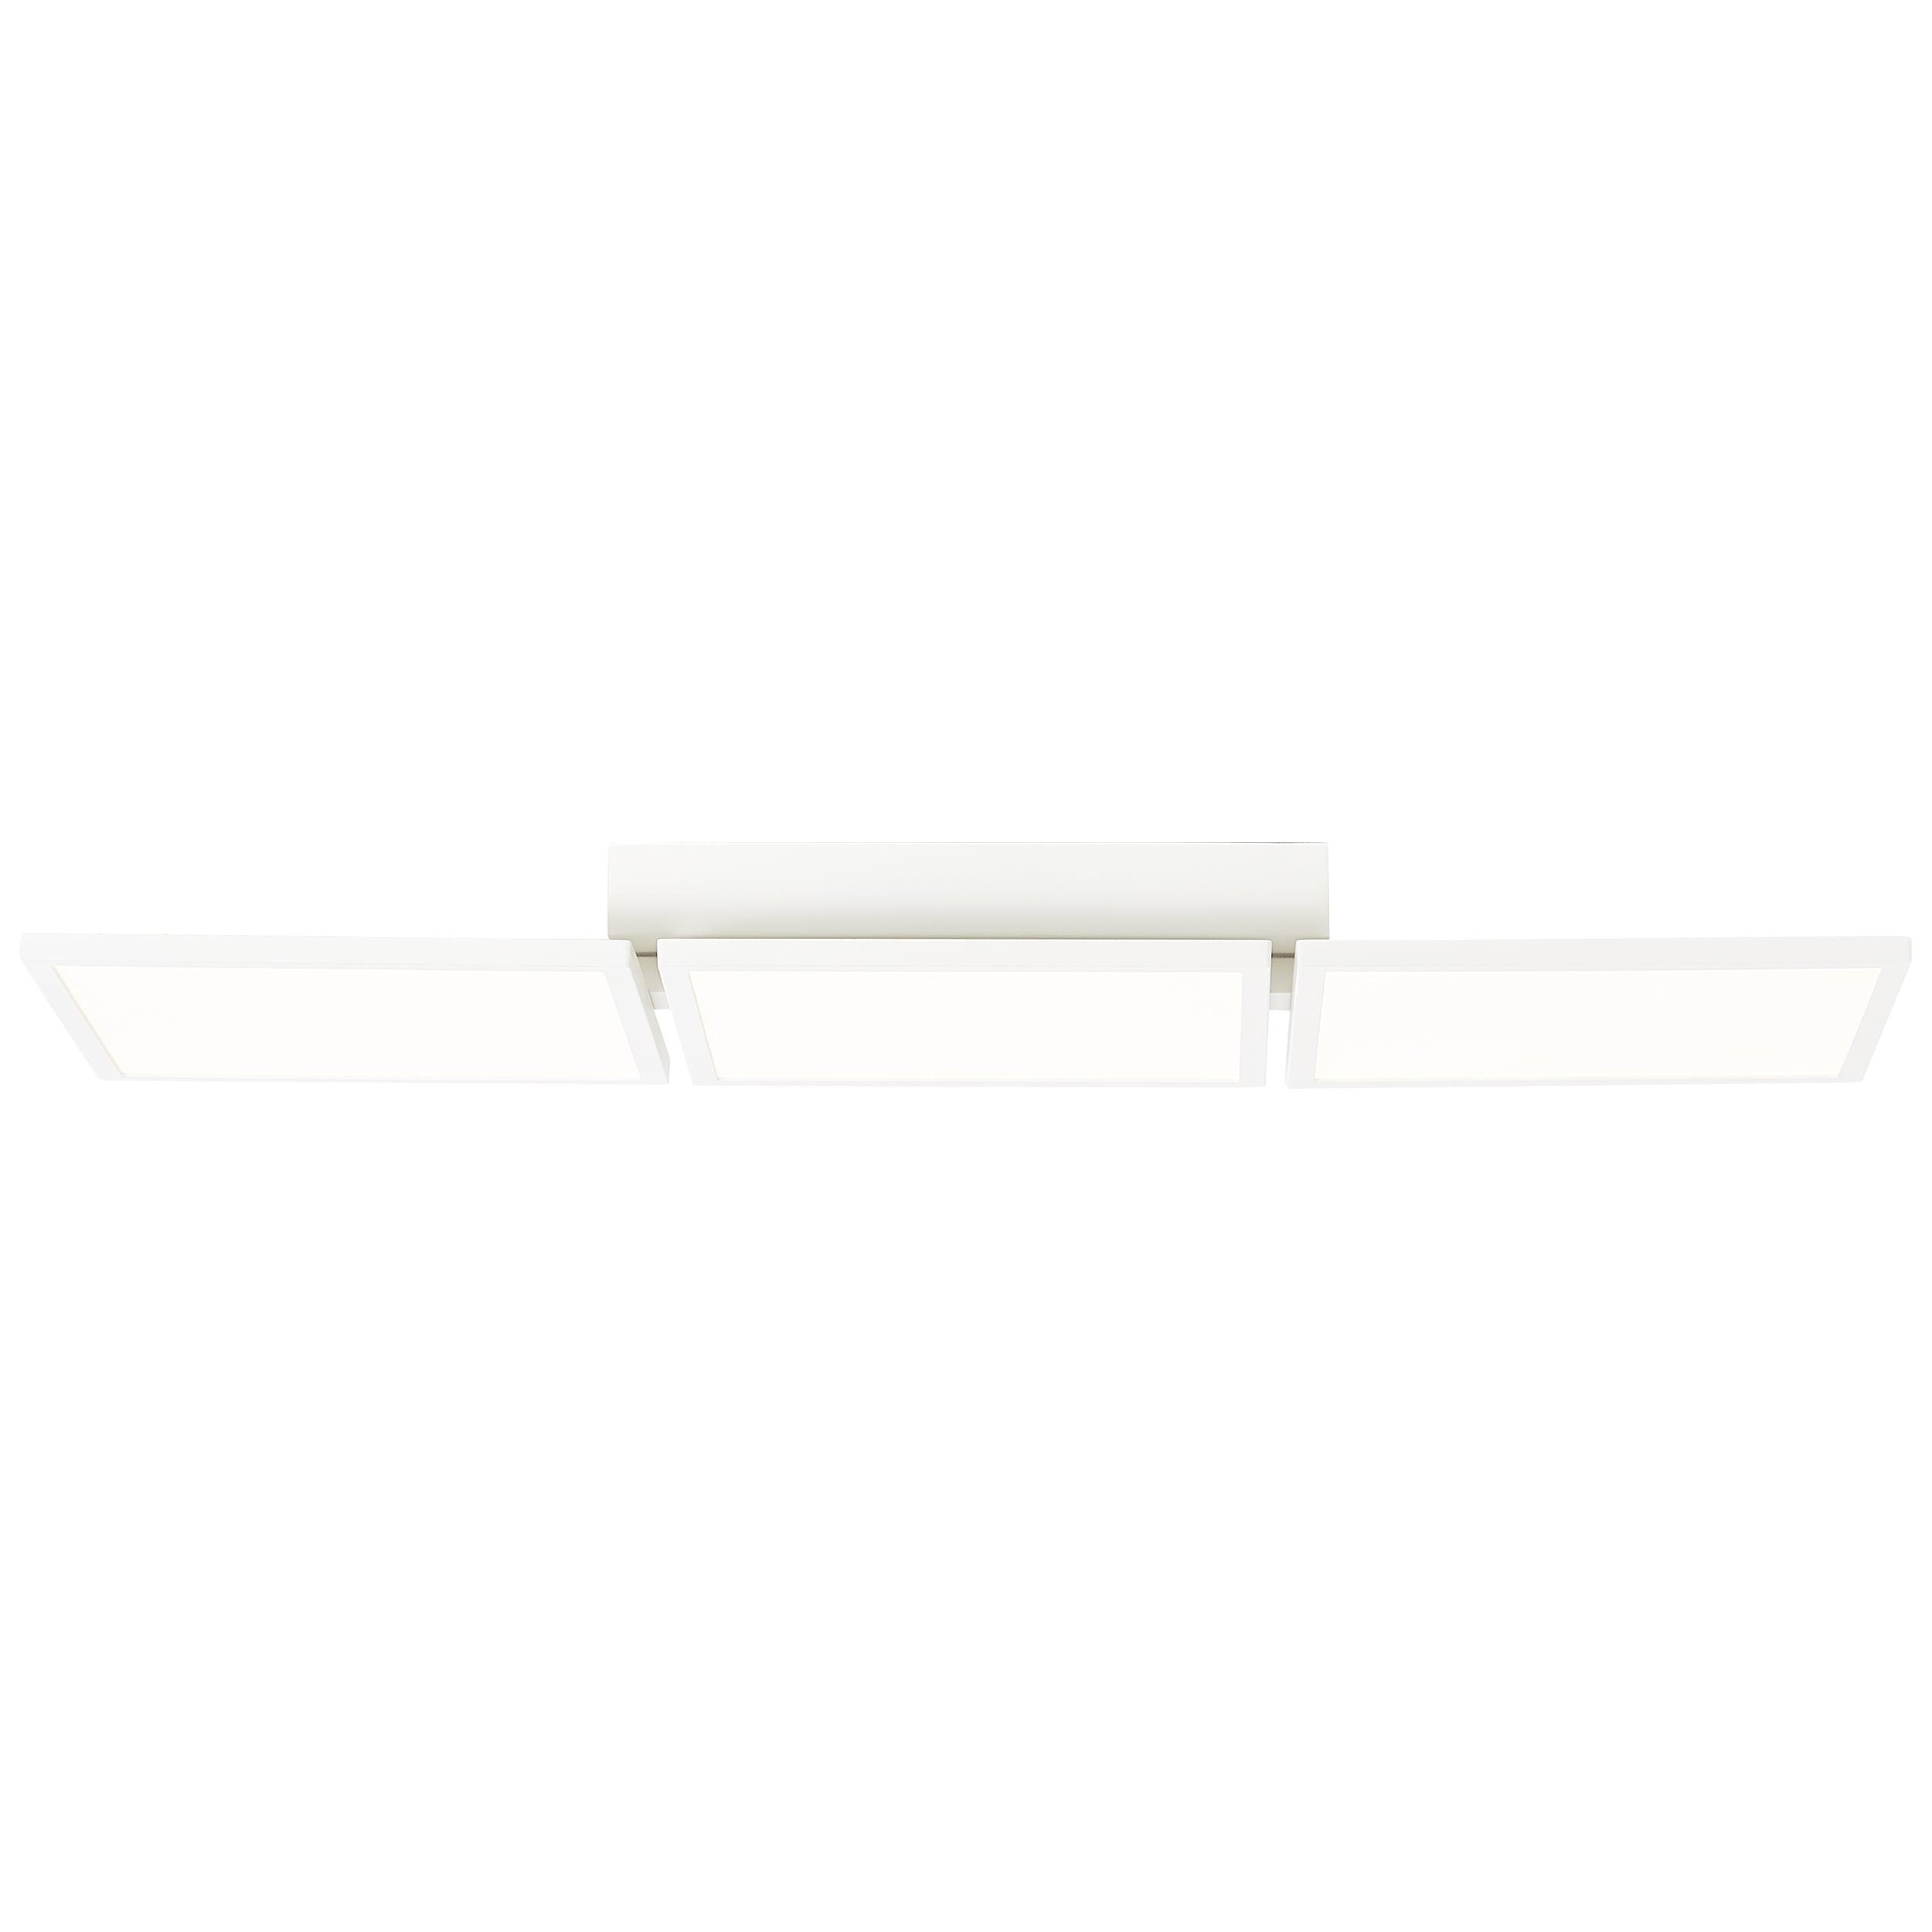 AEG Garek LED Deckenaufbau-Paneel 77x25cm sand/weiß